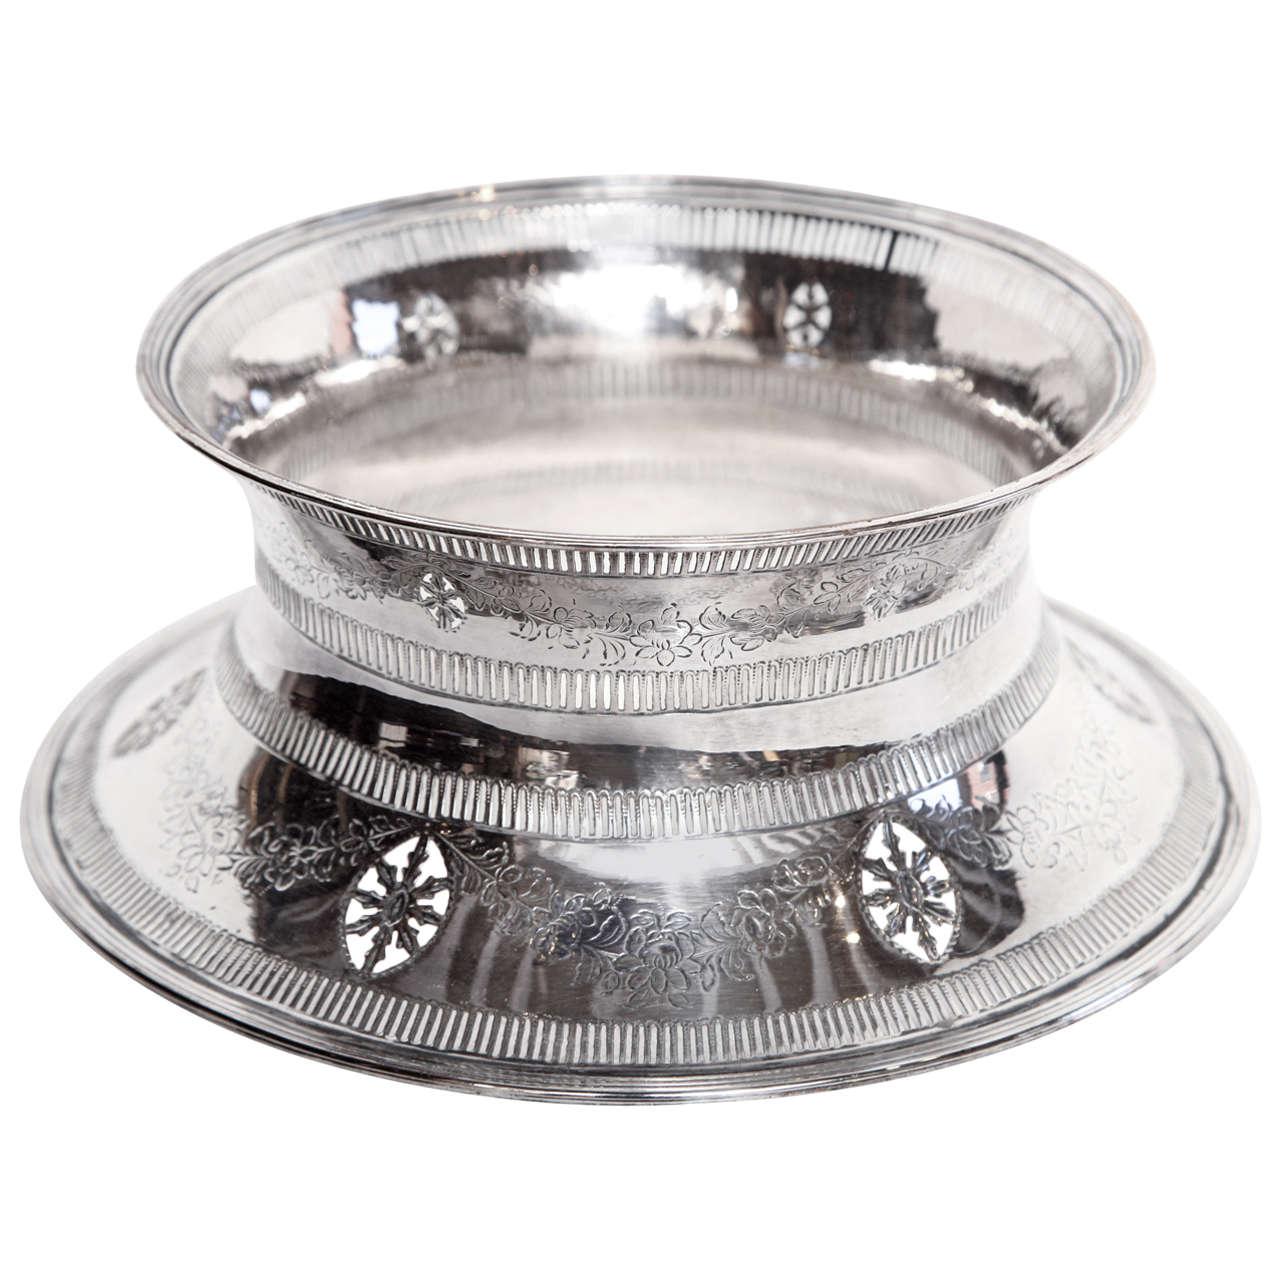 19th Century Irish, Silver Plated Potato Ring